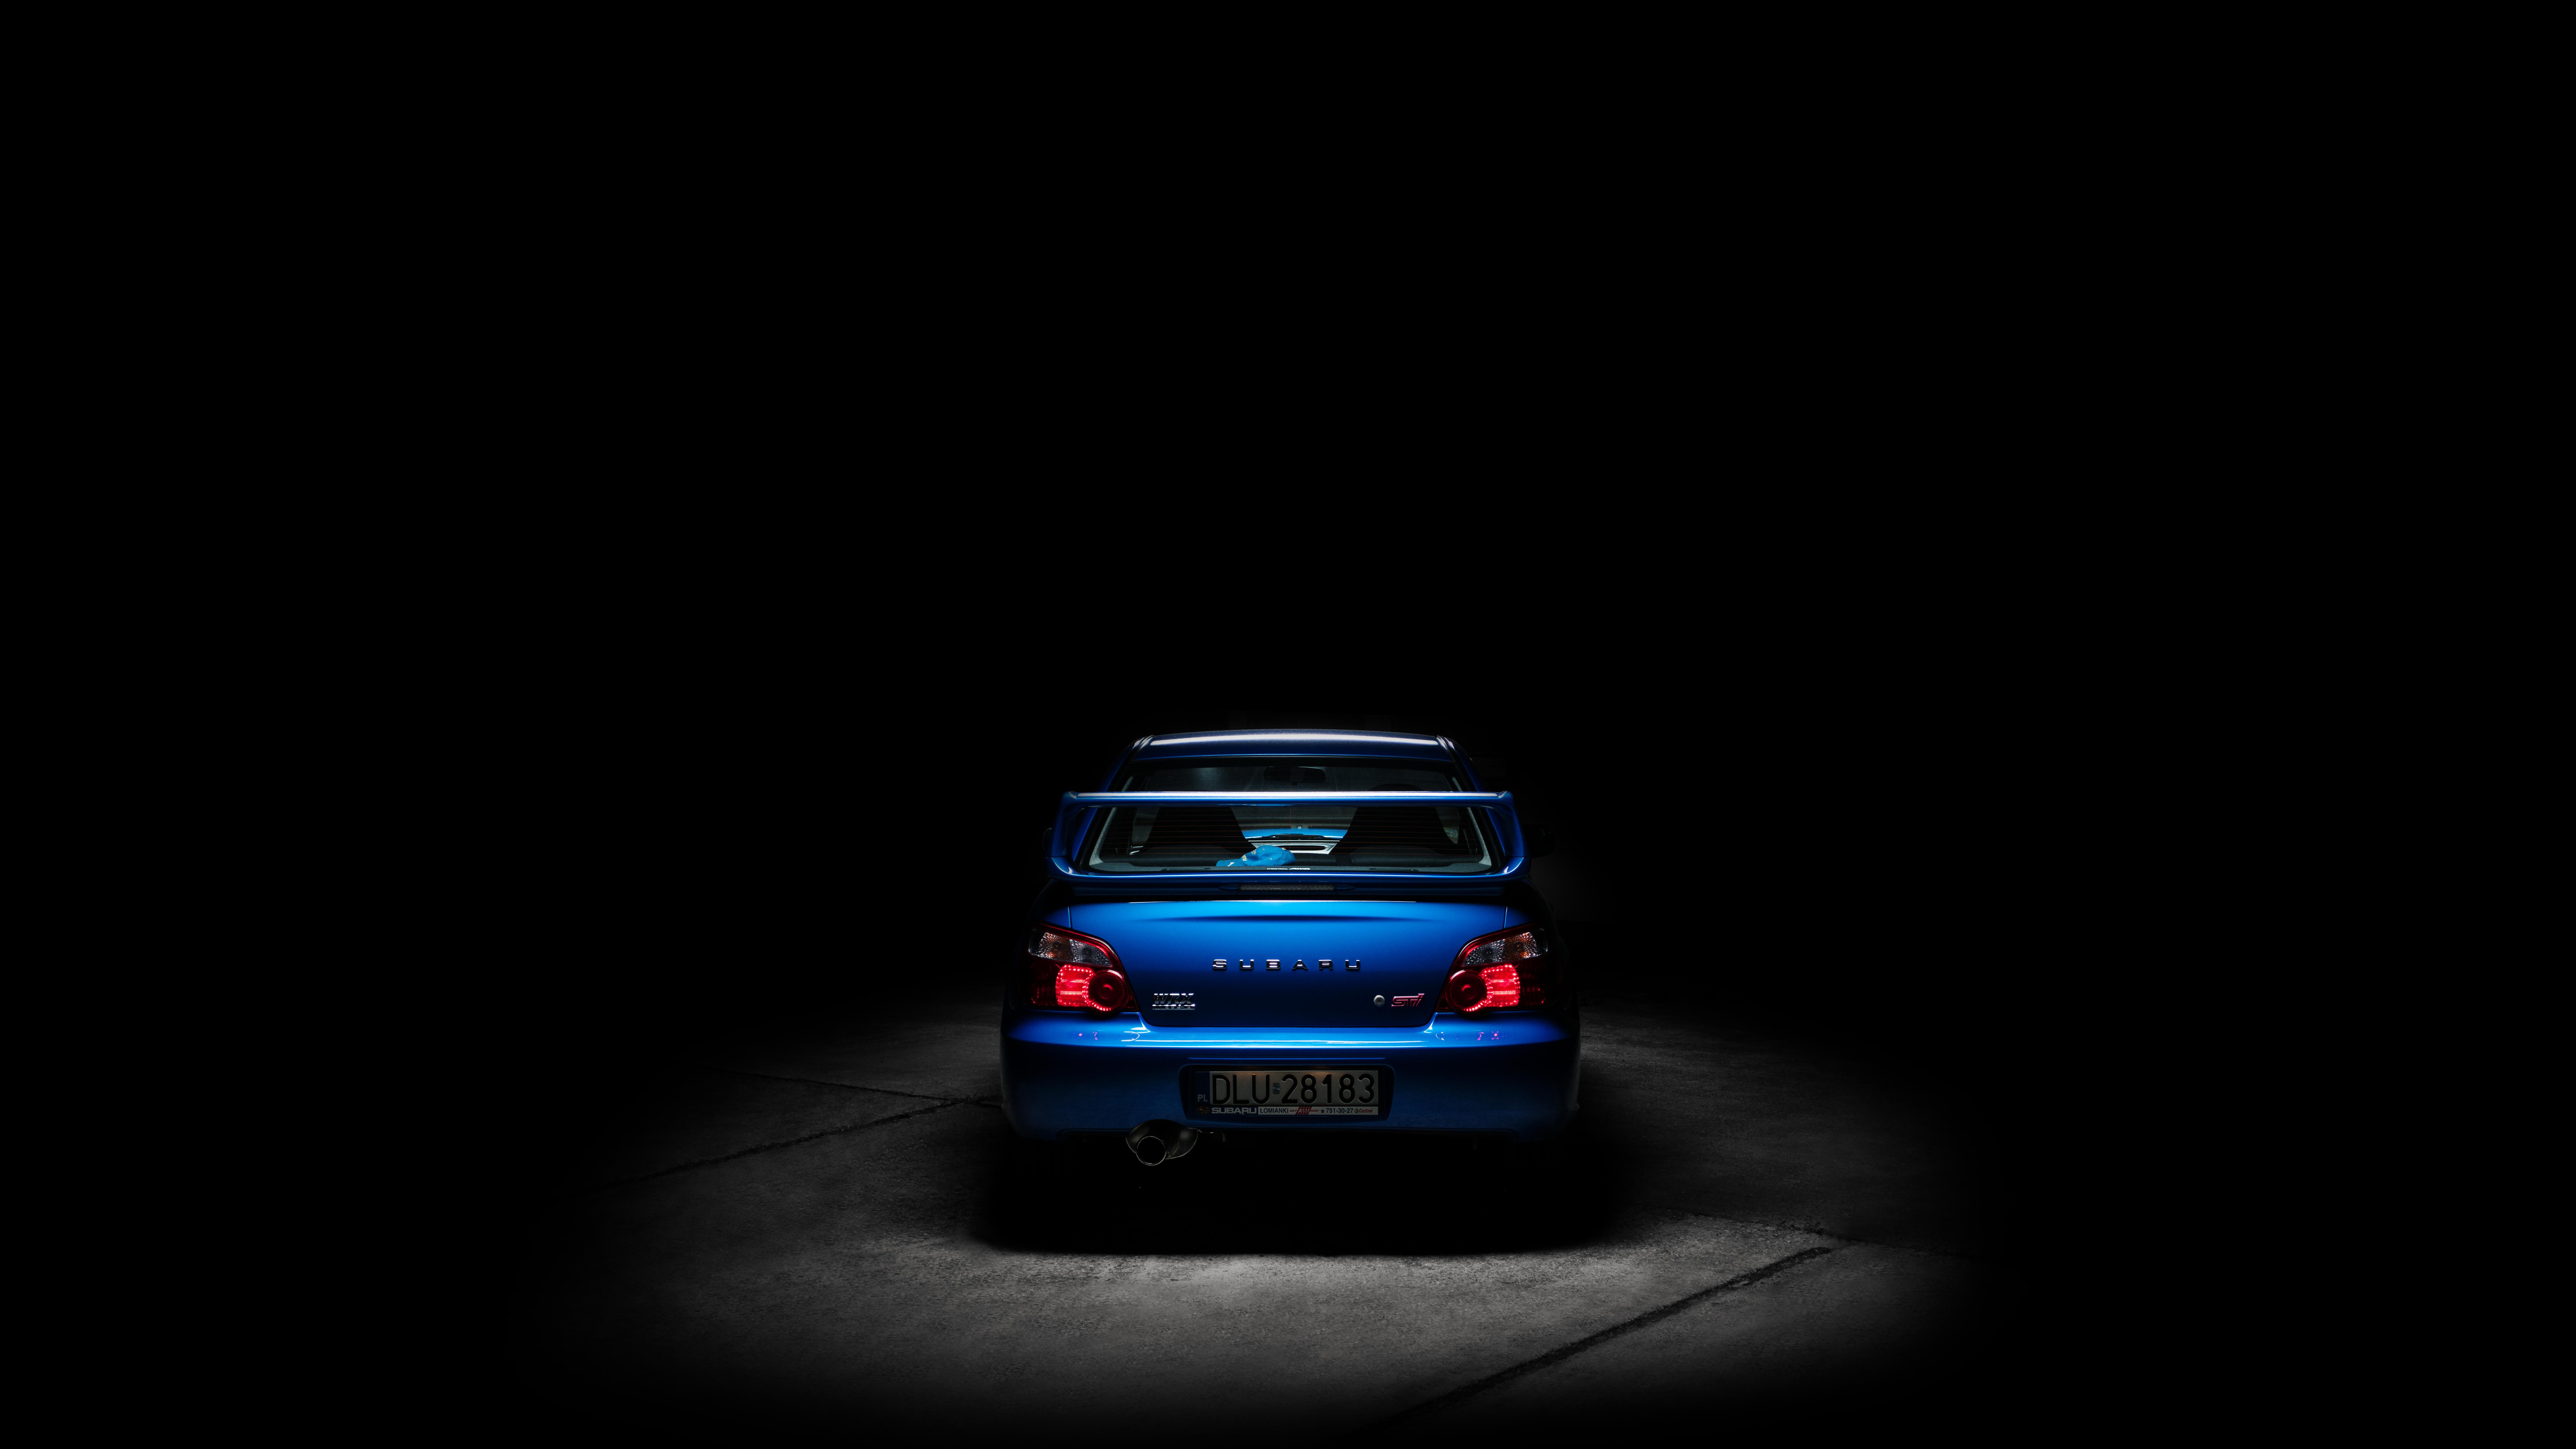 TAPETA: Subaru Impreza WRX STI